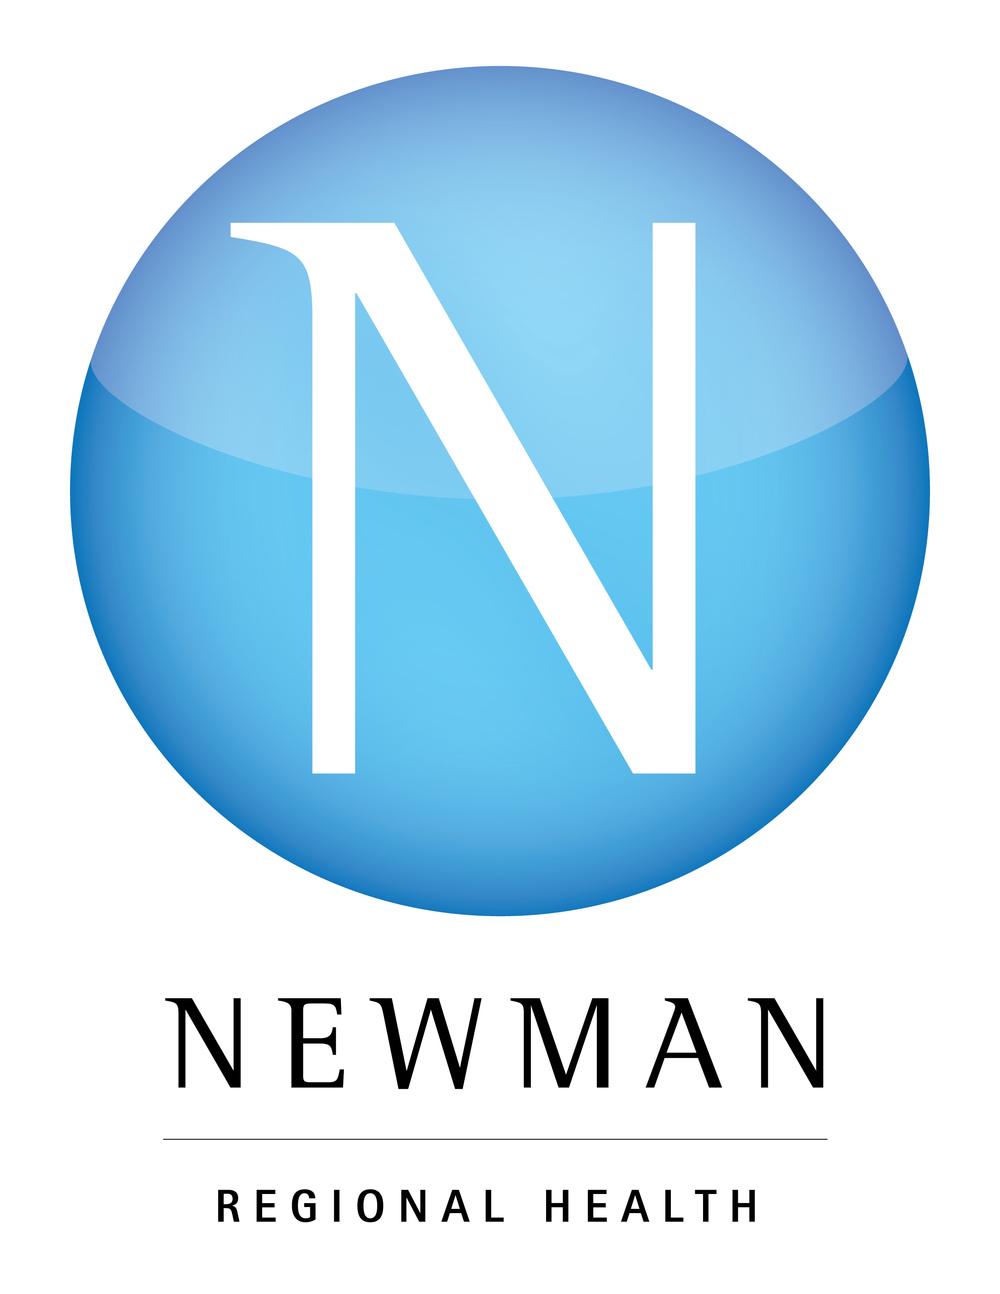 NRH logo.jpg